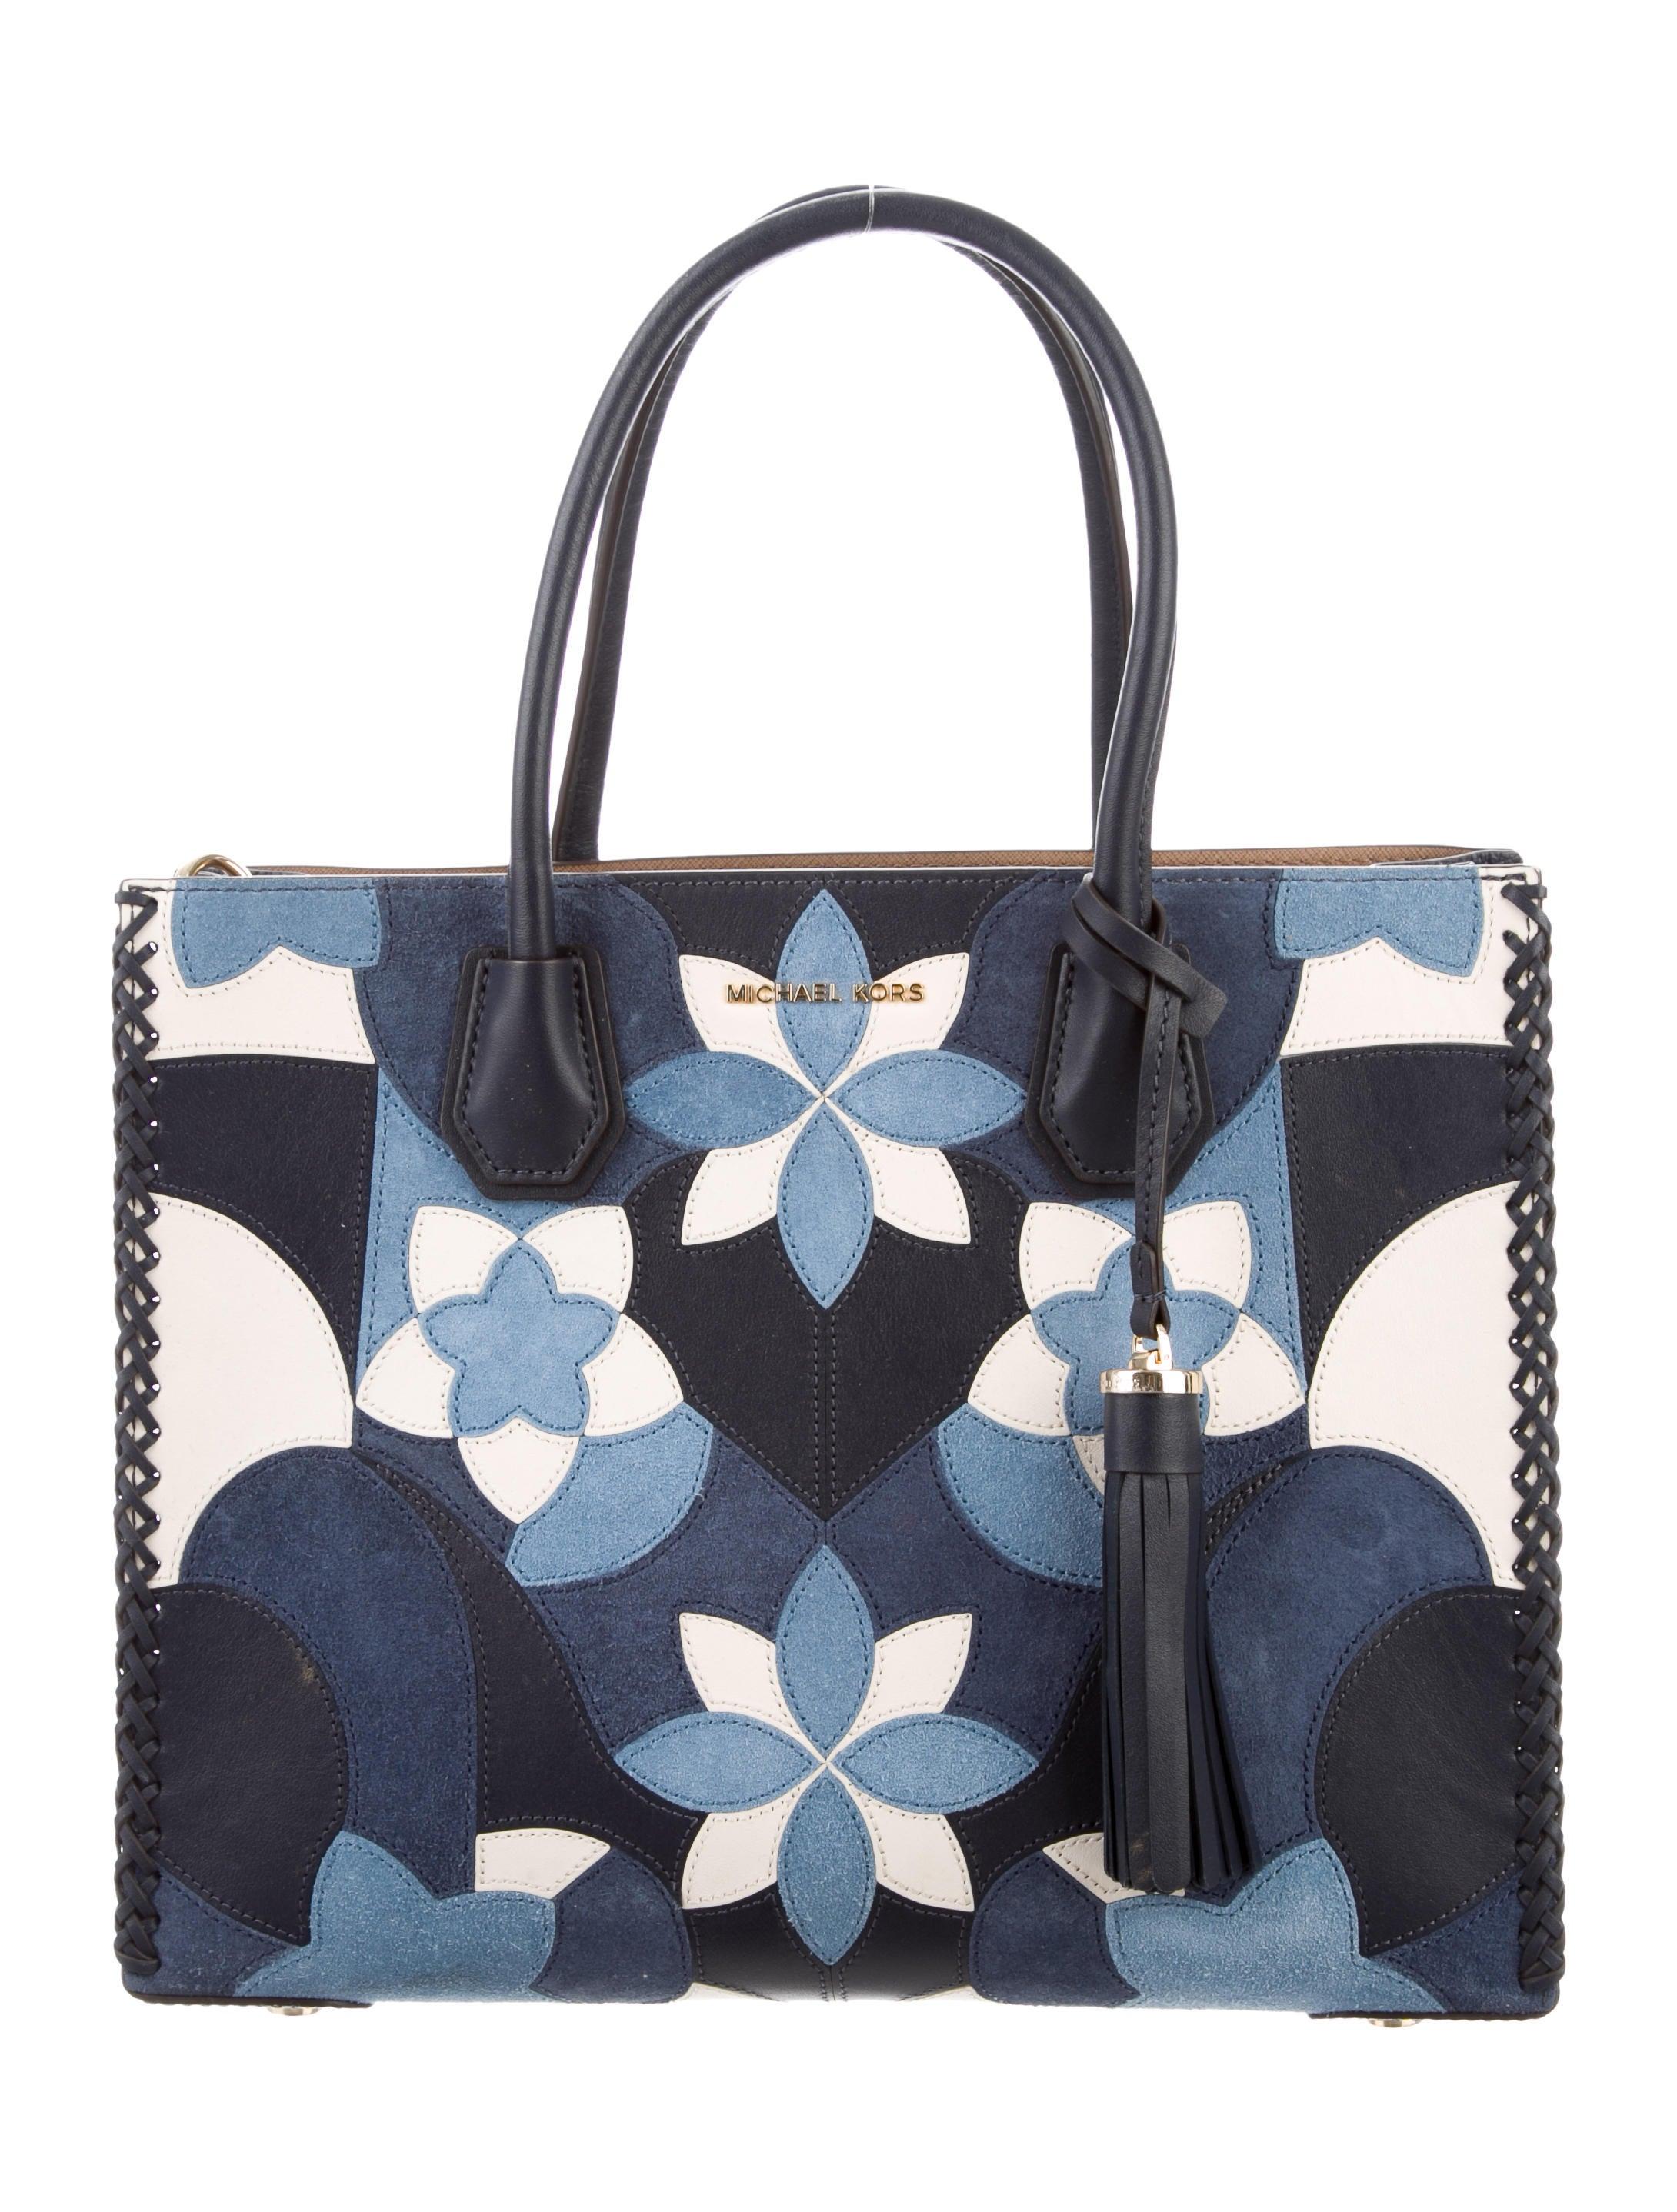 61d763a0a0 Michael Kors Mercer Large Floral Patchwork Tote - Handbags ...